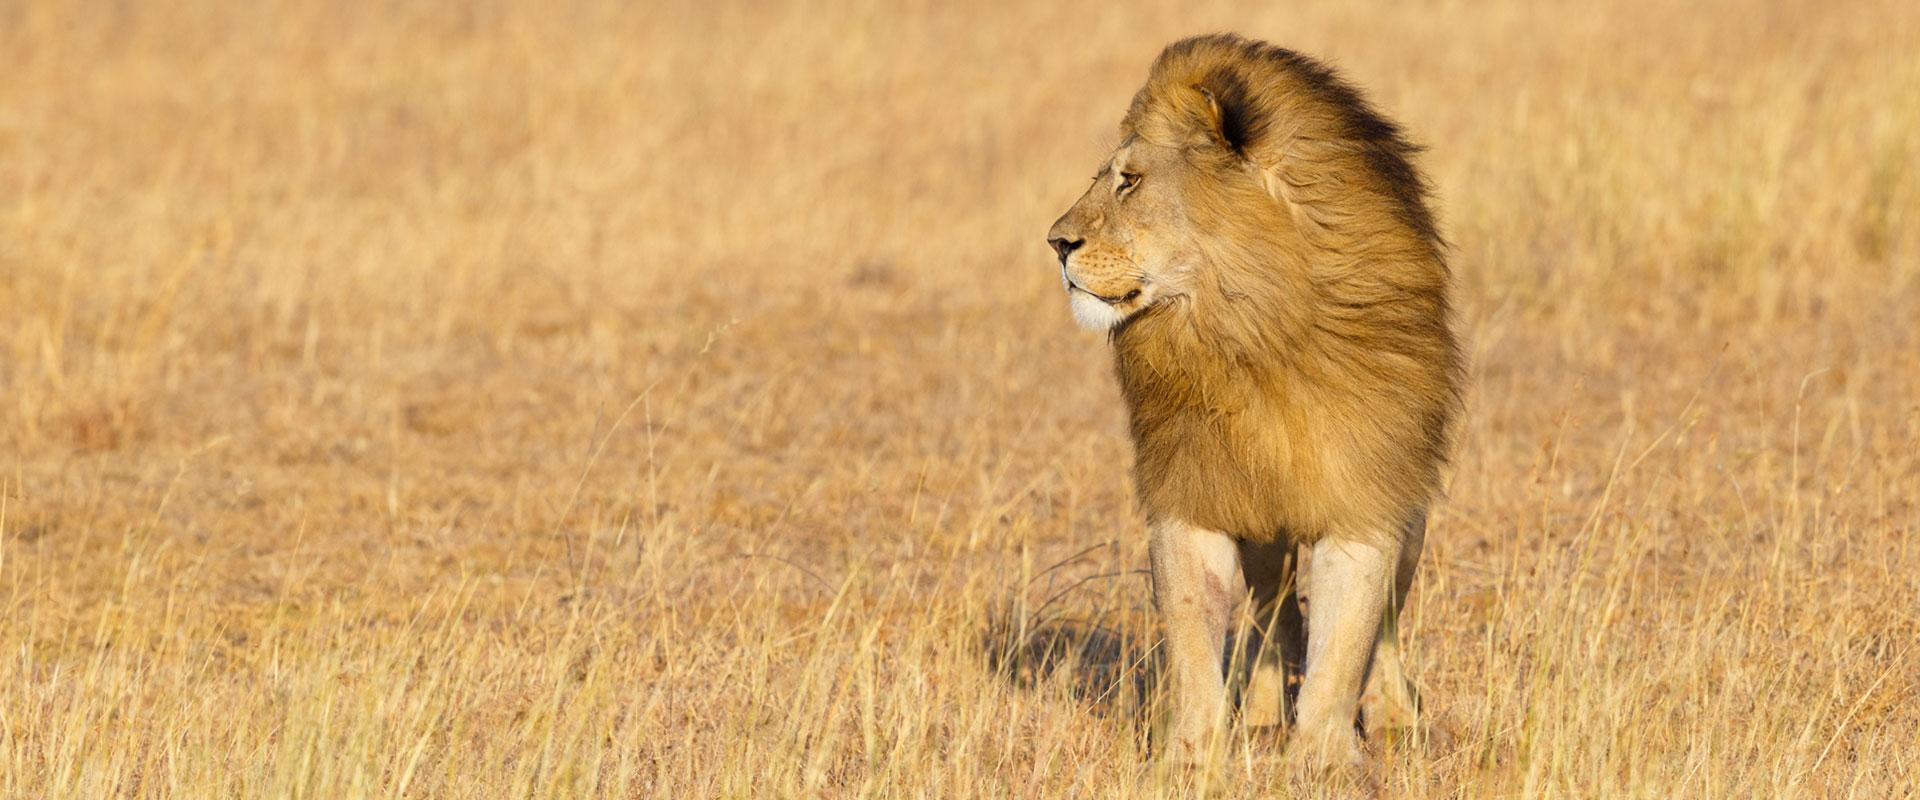 lion in tanzania safari tour